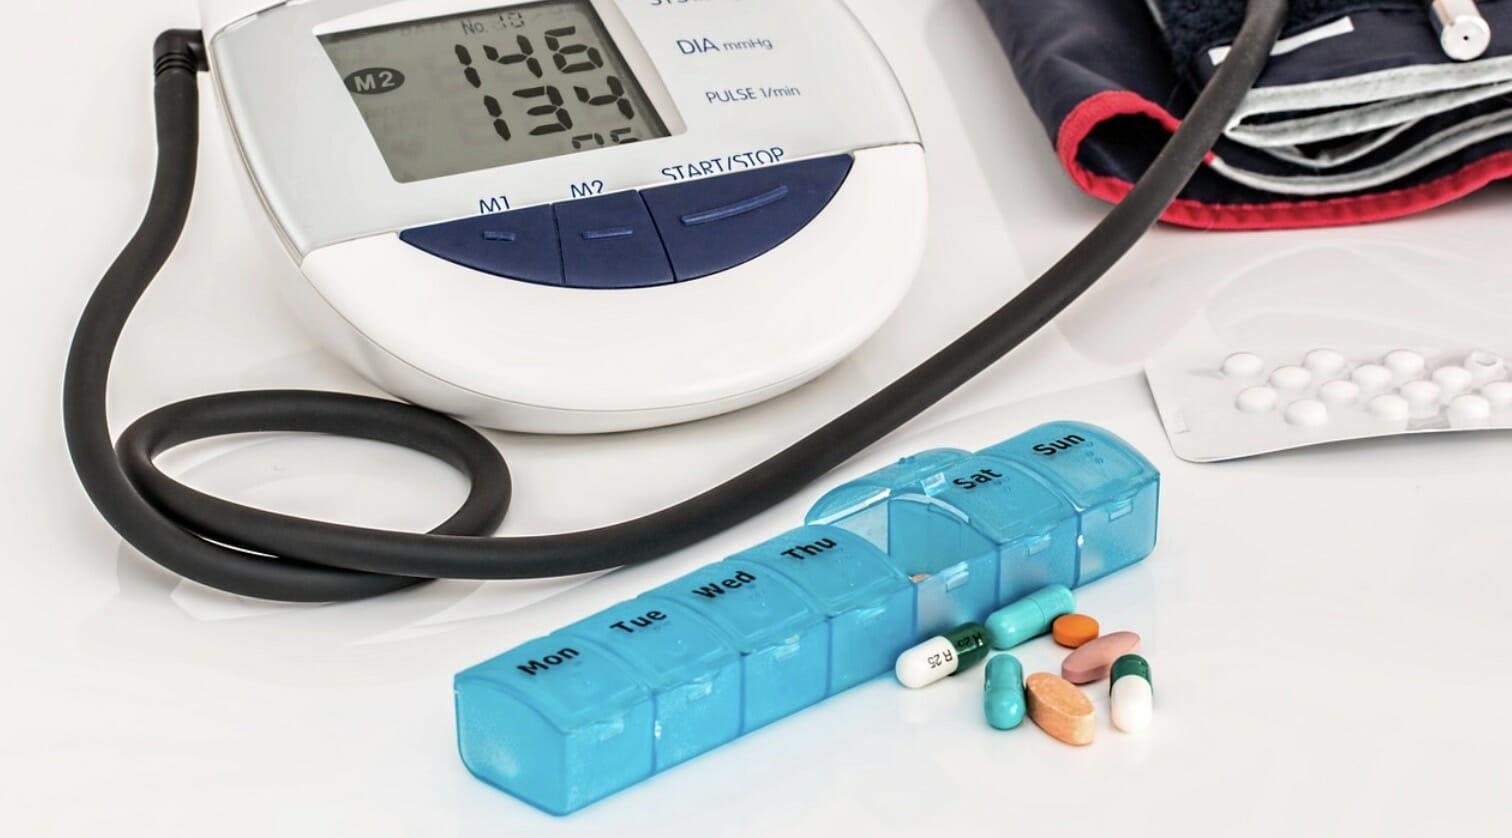 medicine and health gadgets